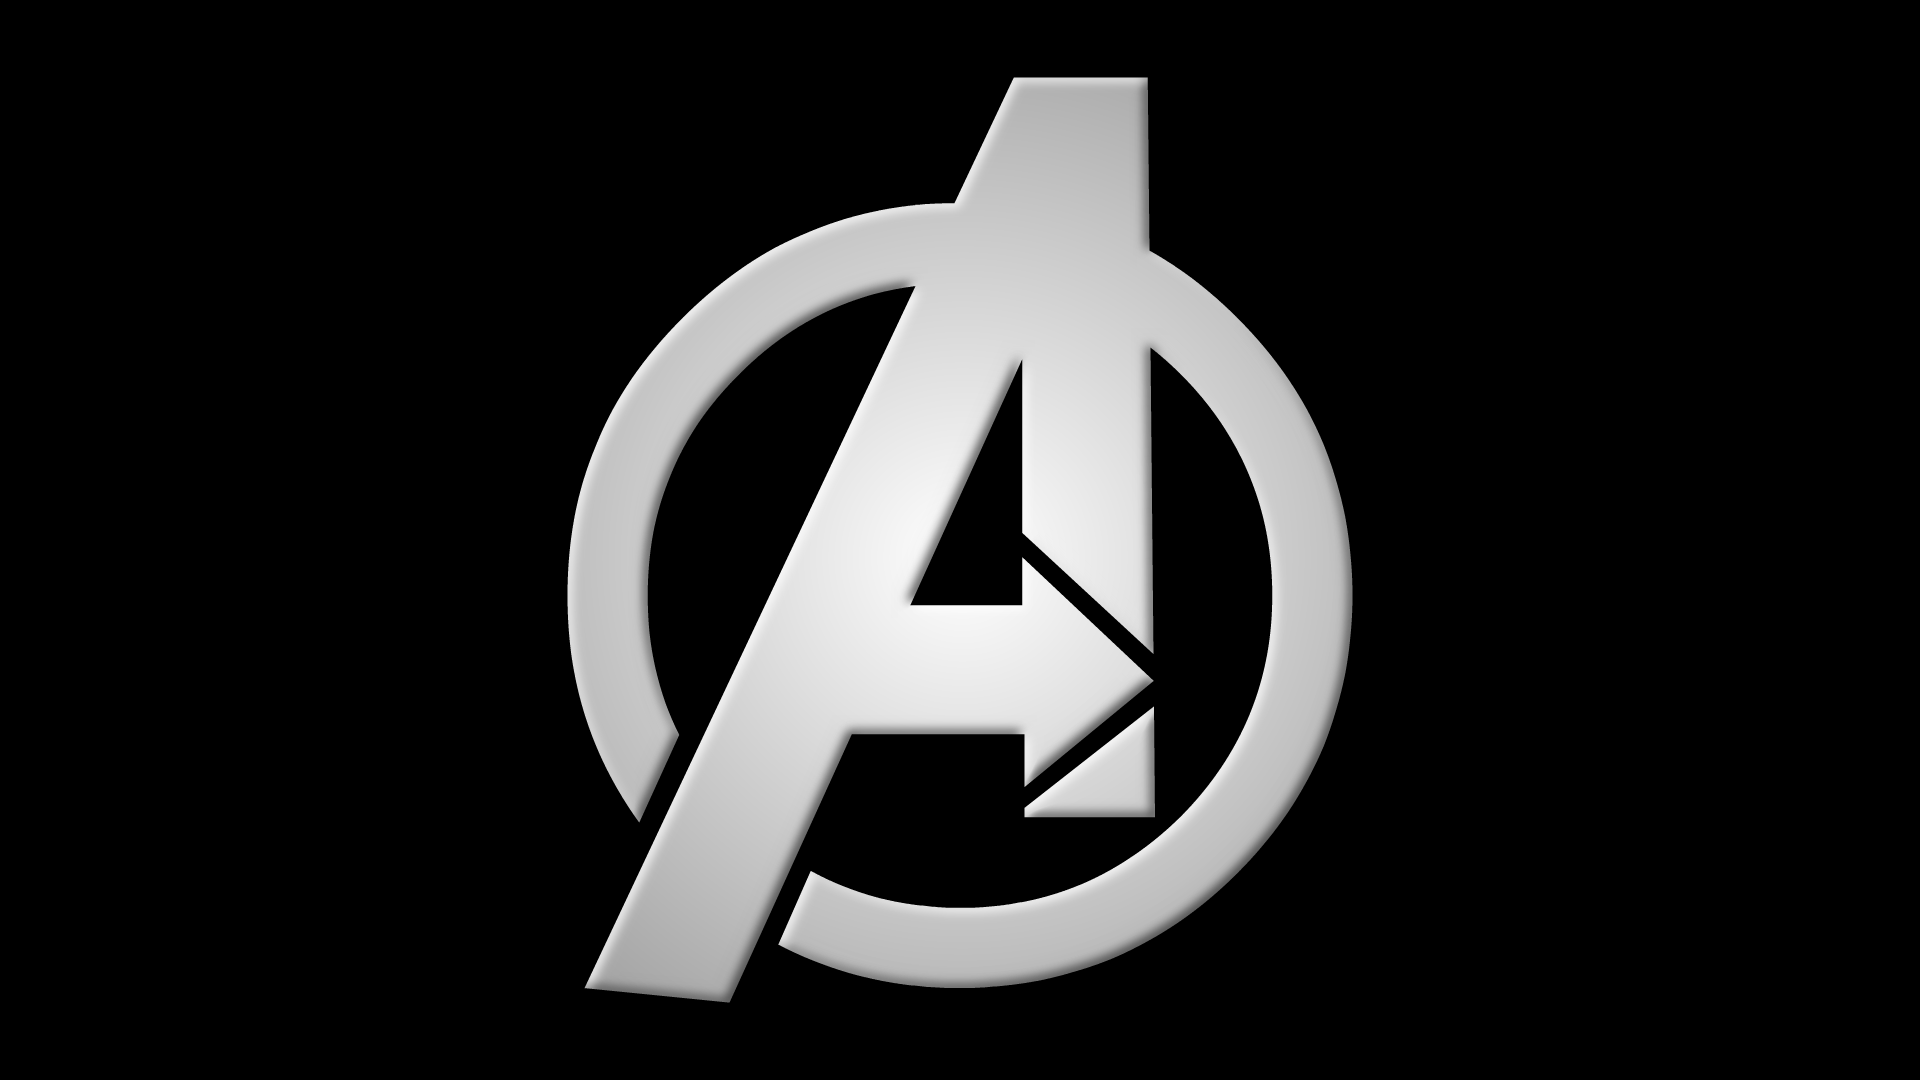 Marvel avengers logo wallpapers top free marvel avengers - Avengers symbol wallpaper ...